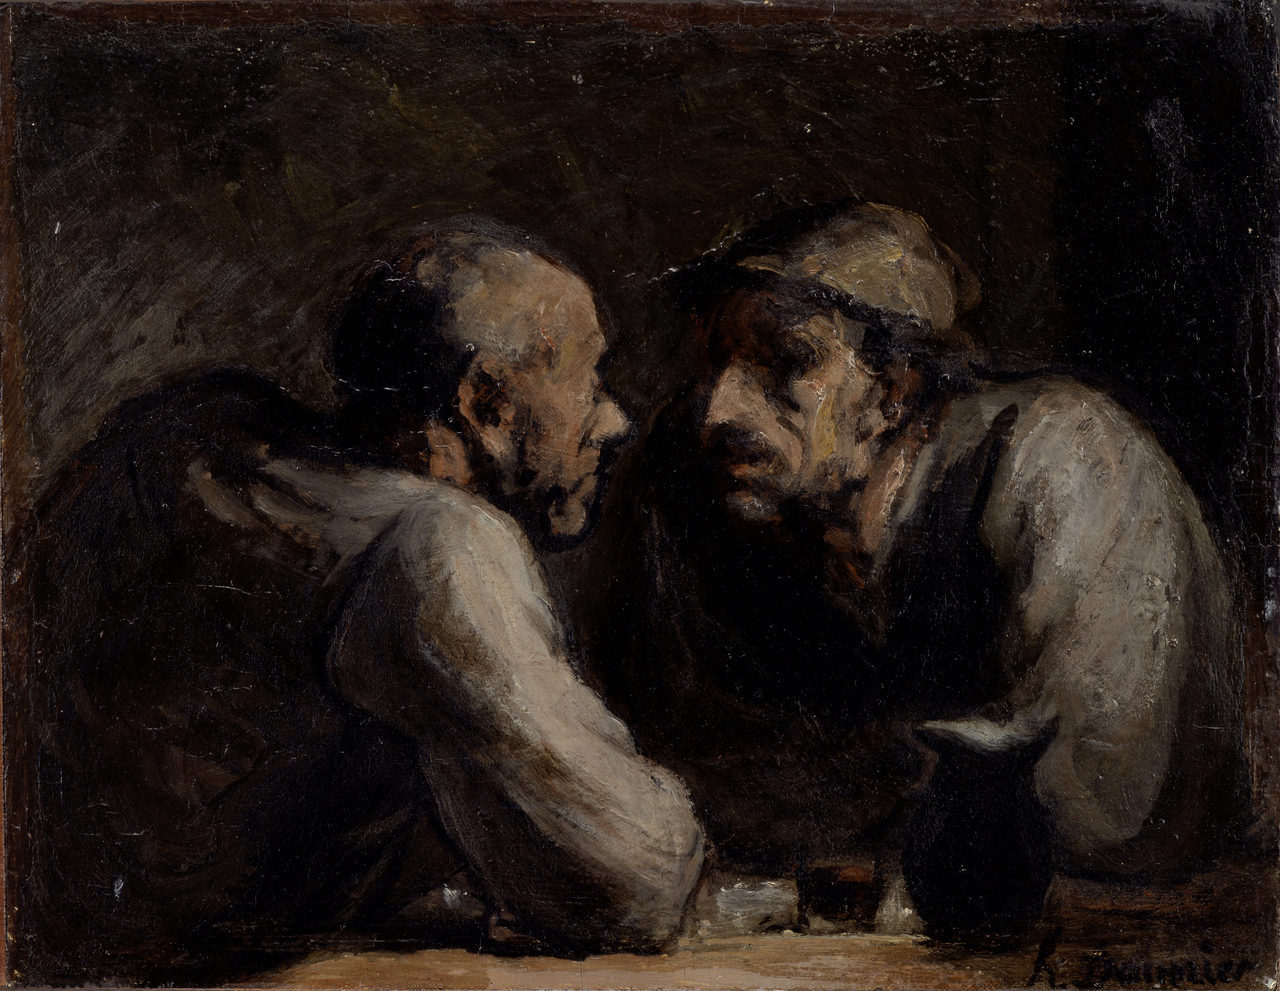 Daumier69